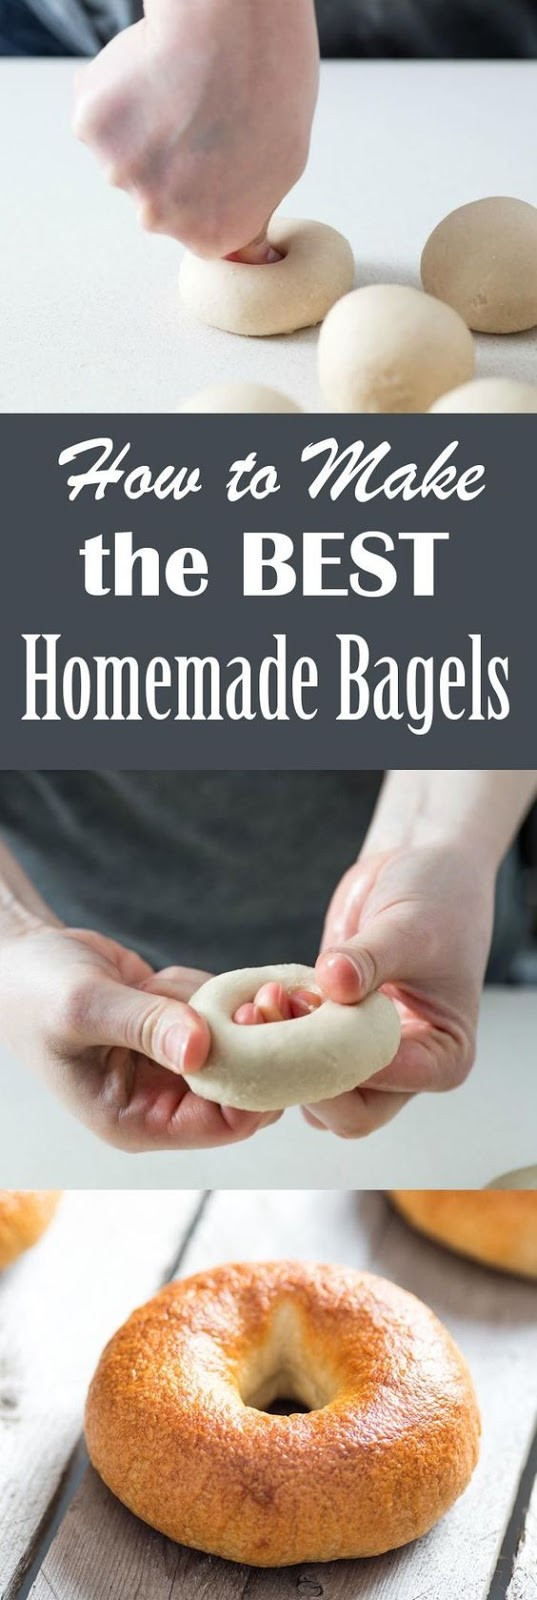 Homemade Bagels Recipe